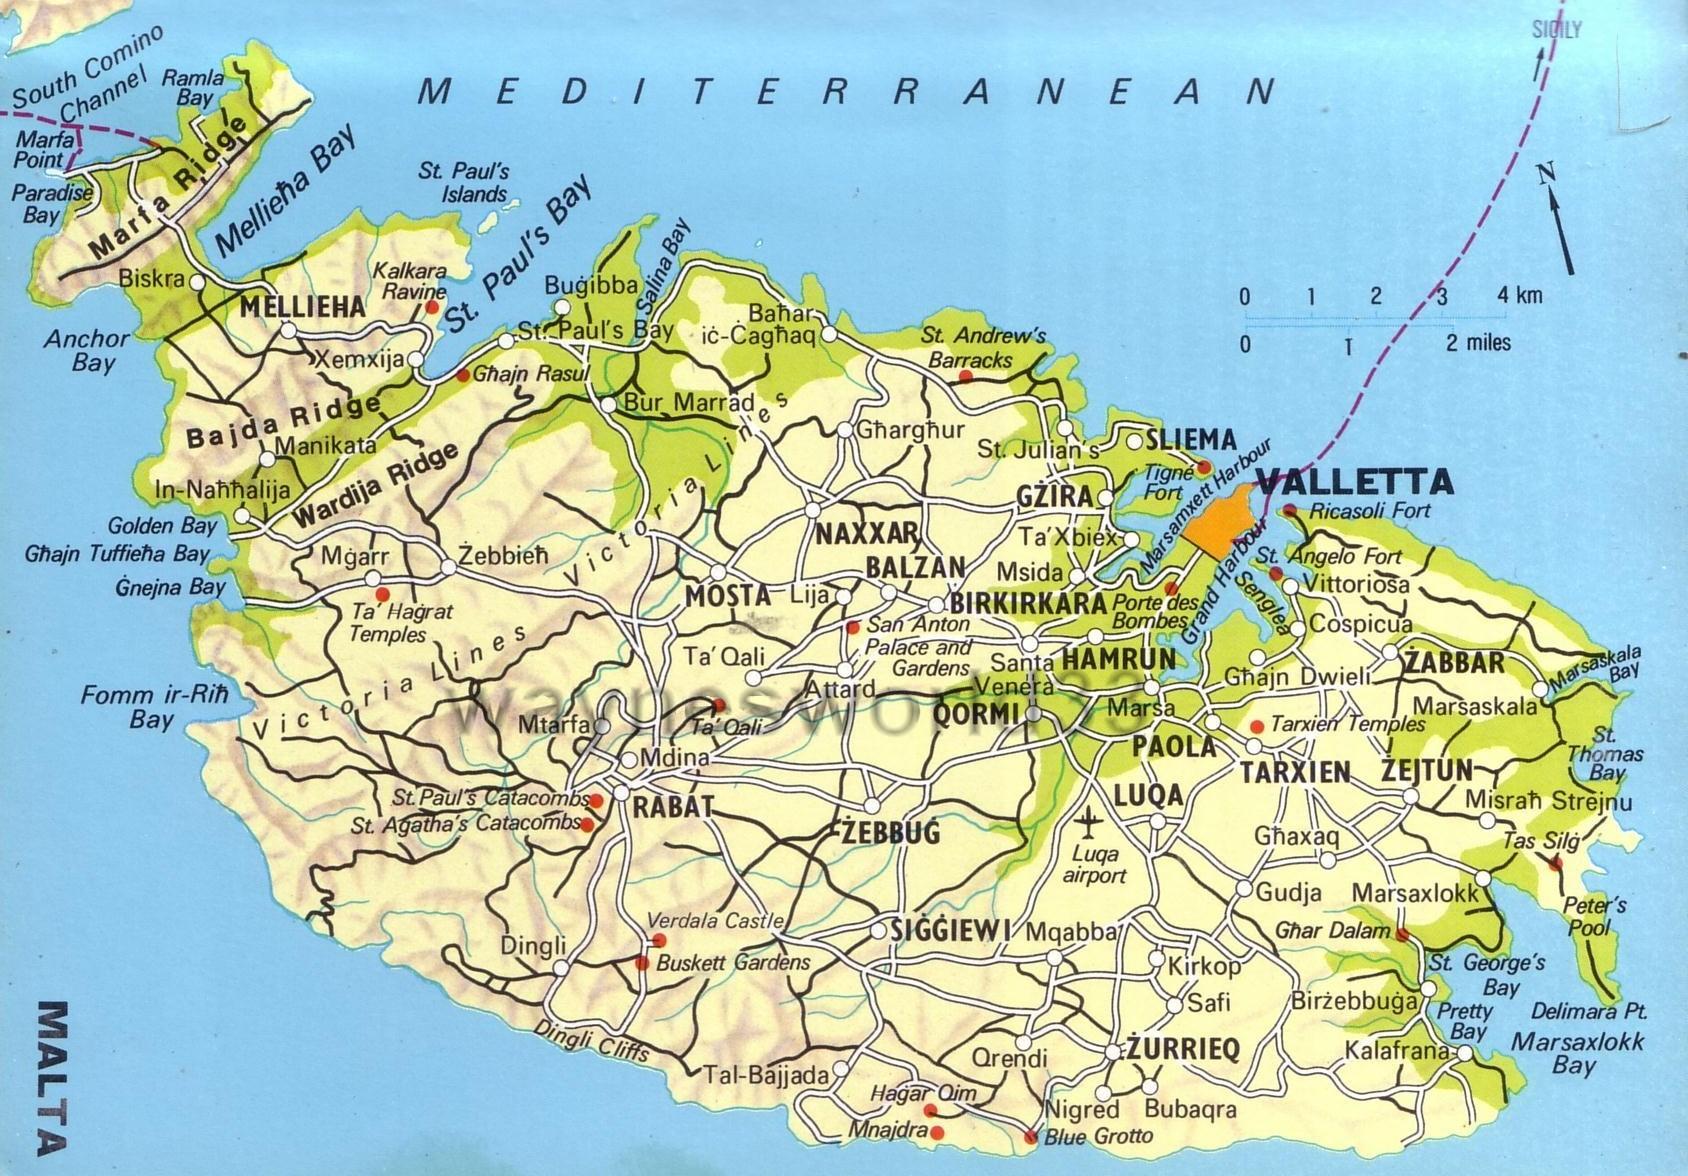 Map of the island of Malta Malta Island Map on san marino, malta people, malta region map, malta points of interest, malta street map, malta weather, malta russia map, emma heming, malta beaches, malta portugal map, cape verde islands map, malta capital map, italy map, maltese map, st.julians malta map, paul in malta map, malta bus route map, malta popeye s, malta climate map, malaysia map, sliema malta map,